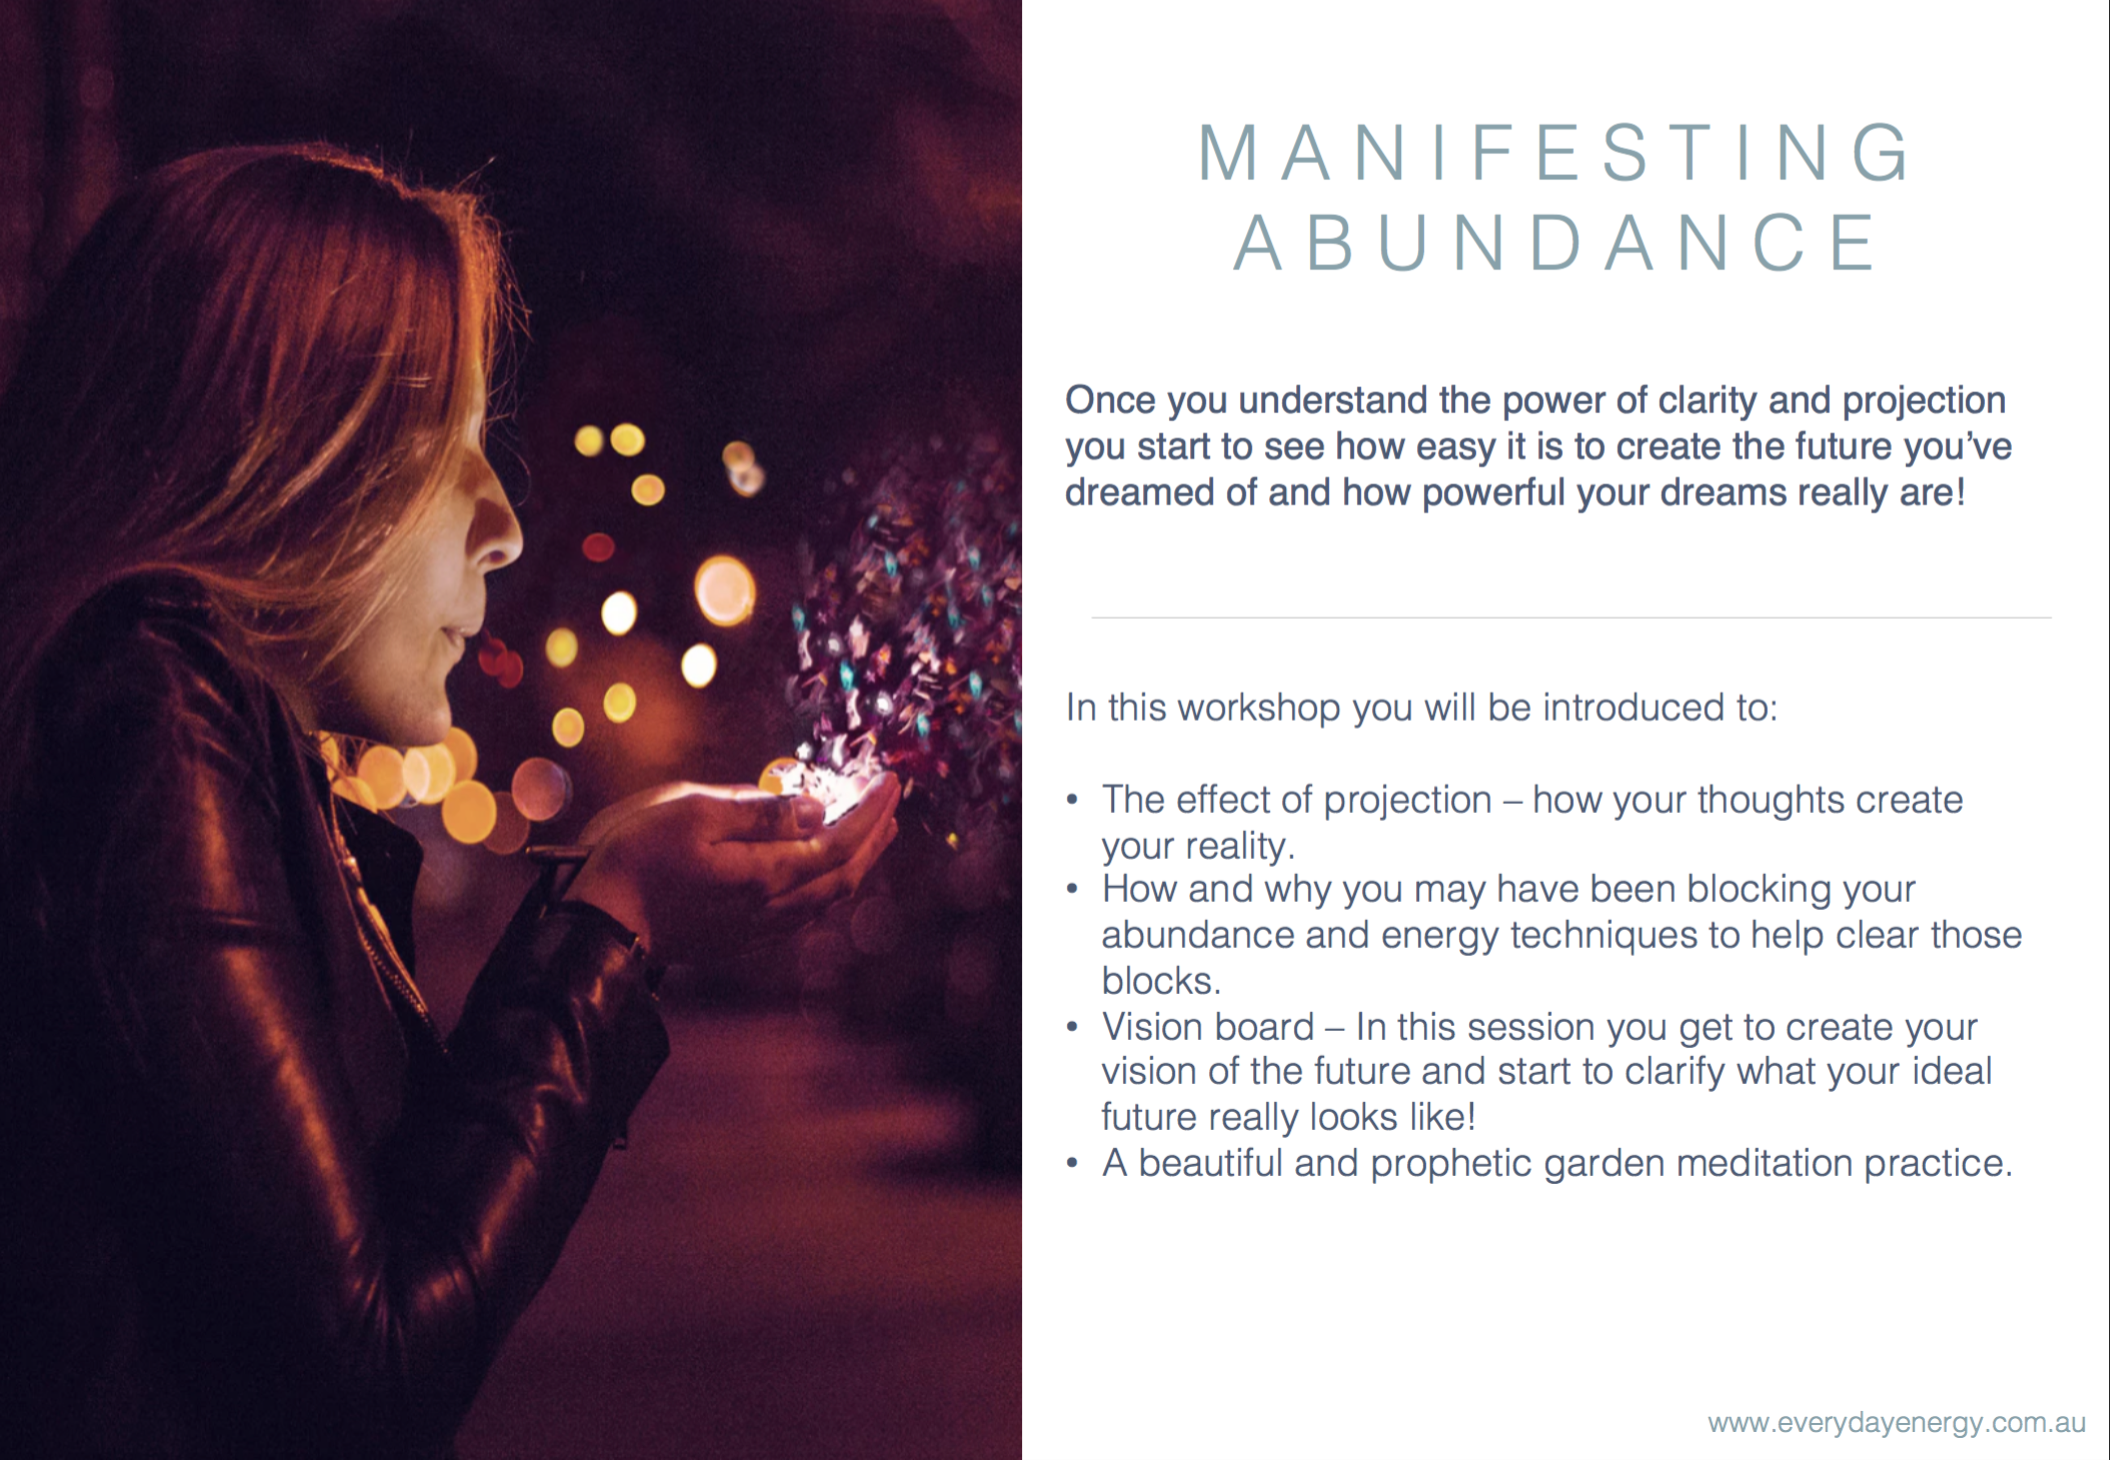 Manifesting abundance - event image.png